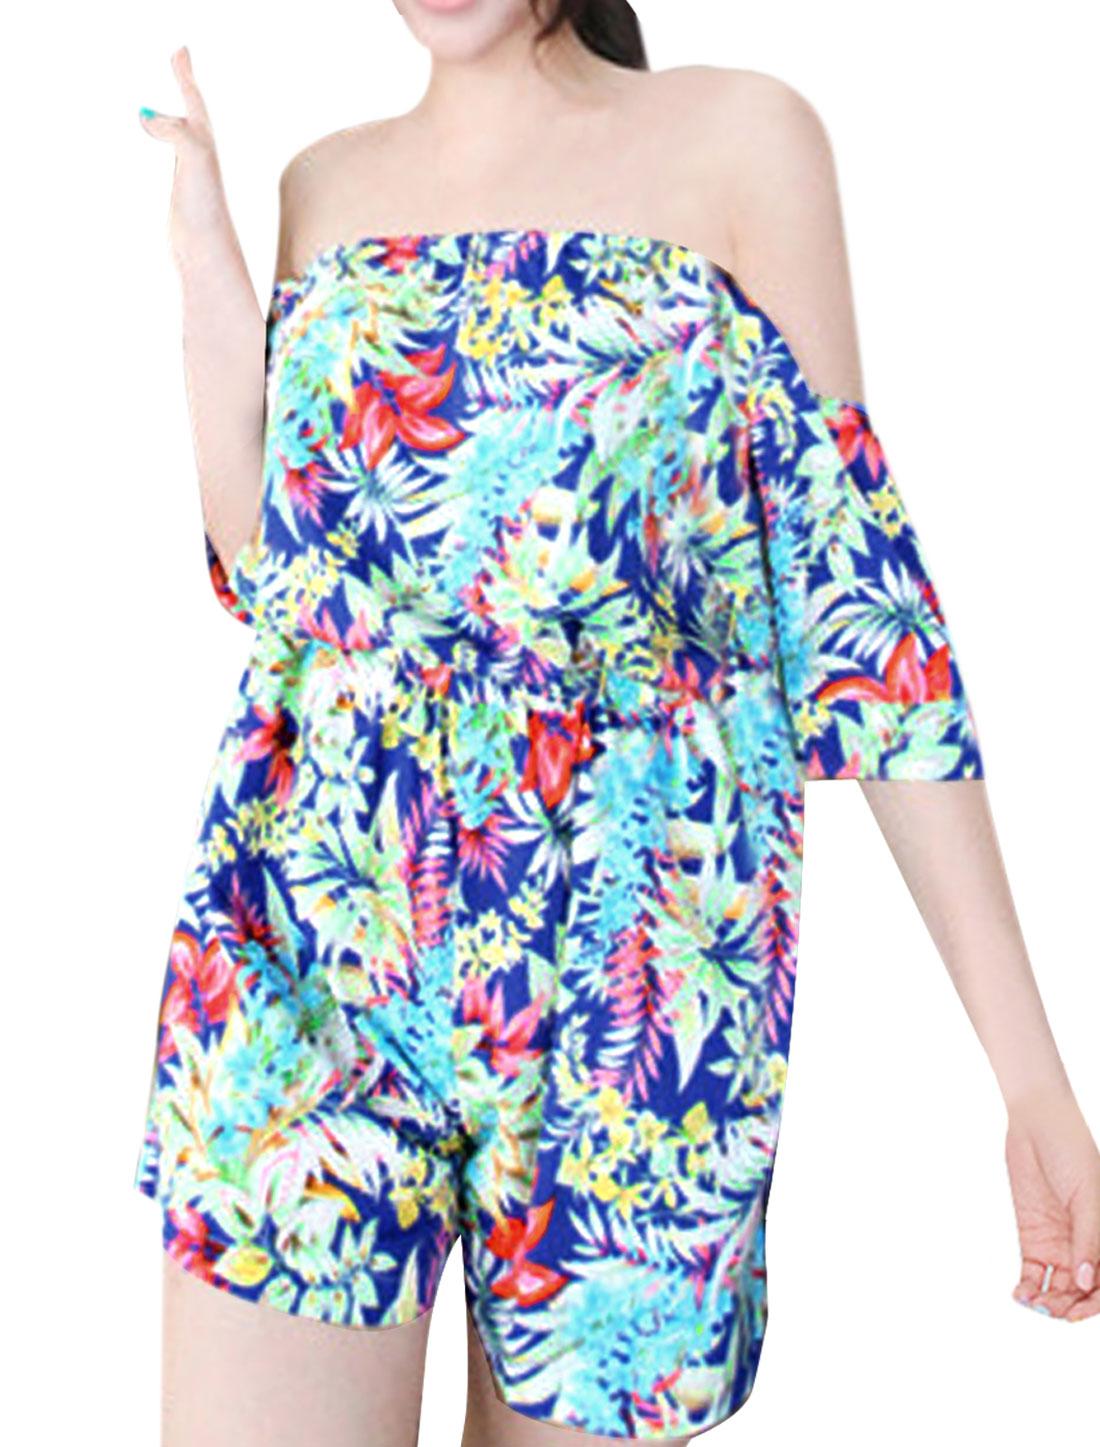 Lady Blue Floral Prints Stretchy Waist Strapless Short Jumpsuit S